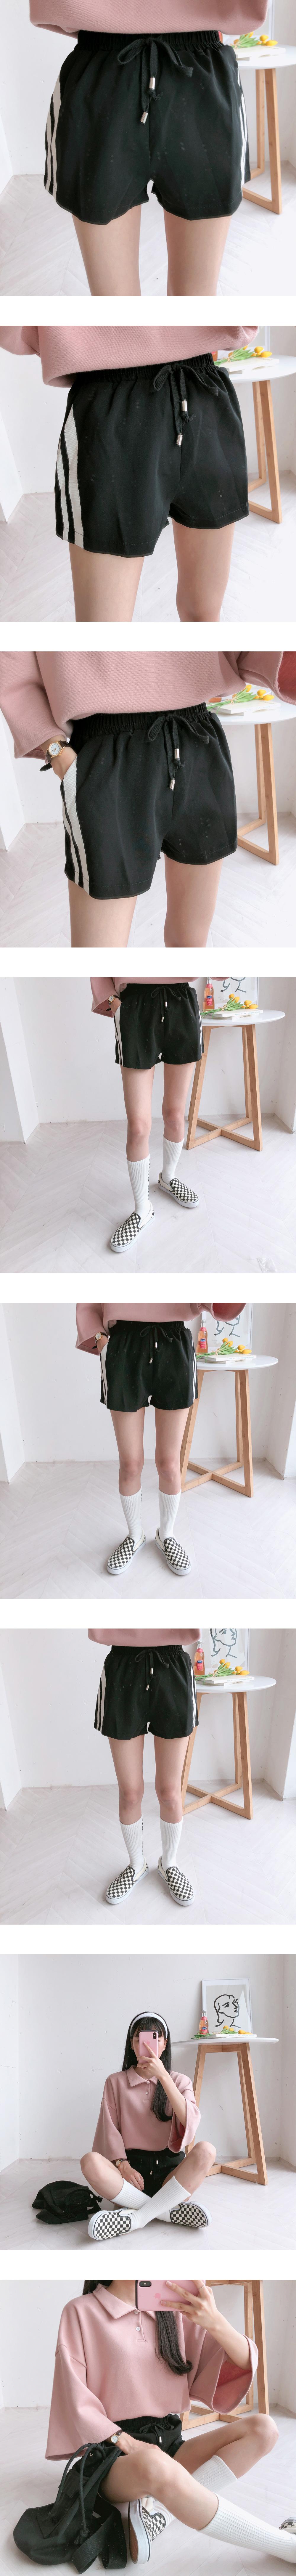 Milky shorts pants